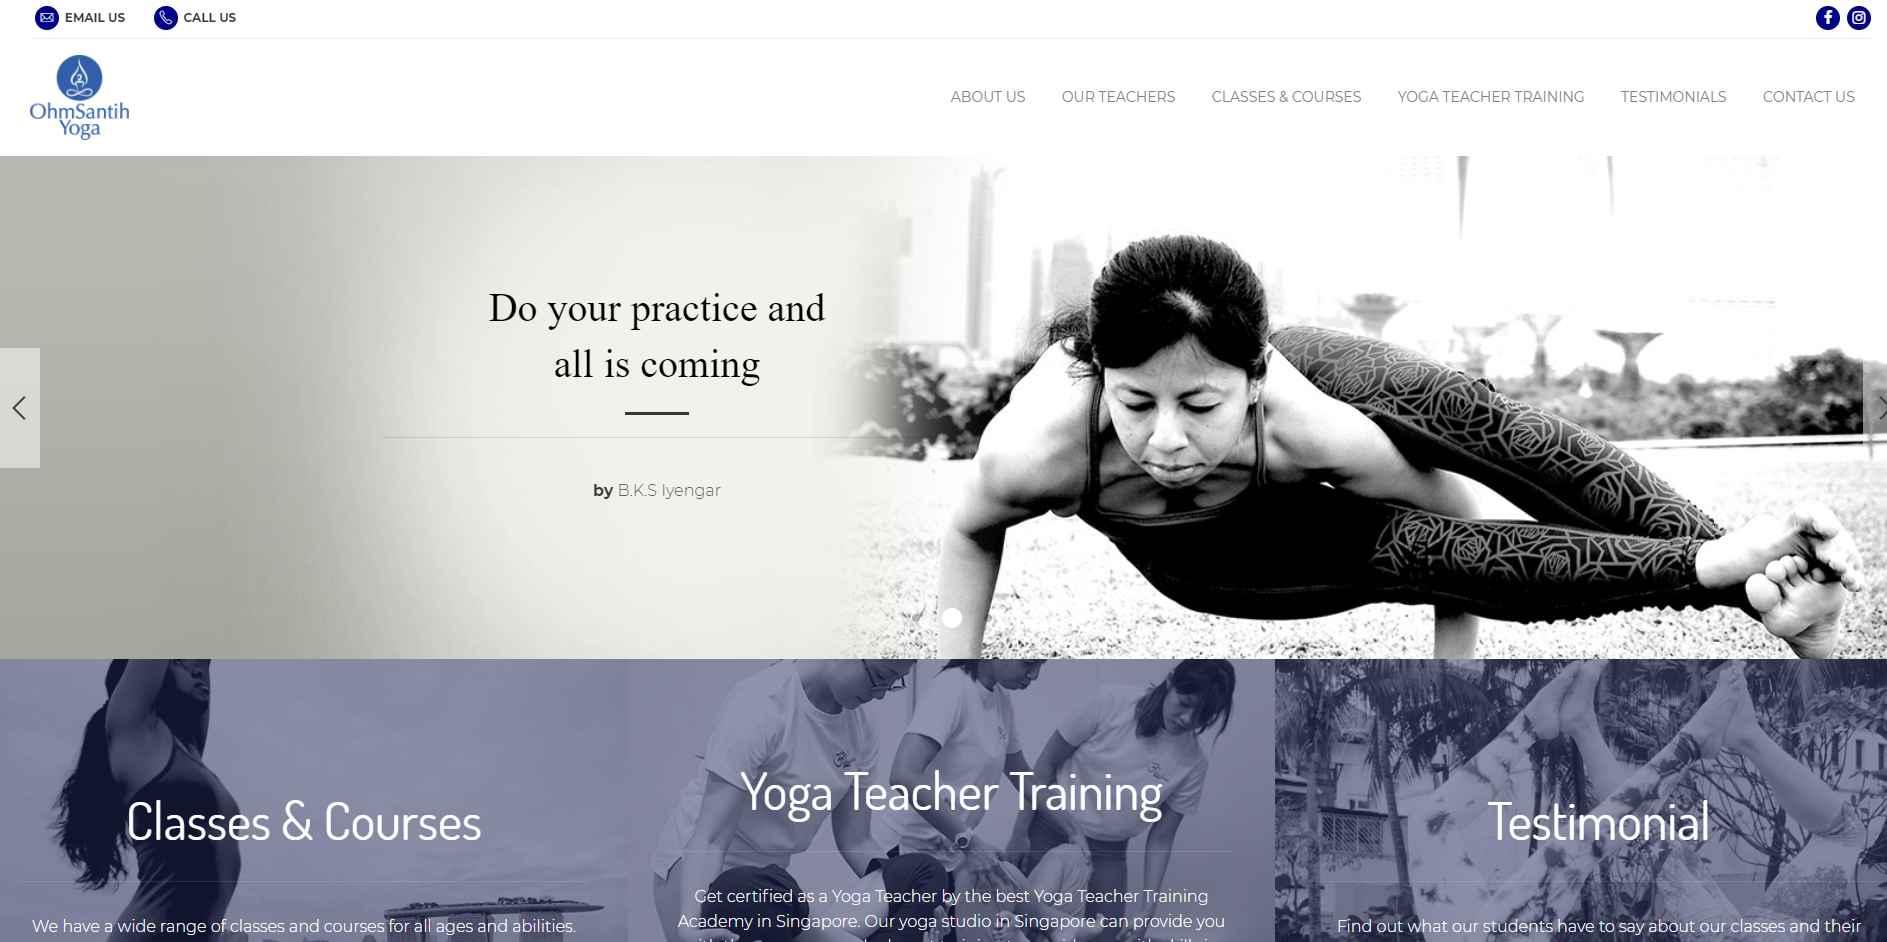 ohm santih yoga Top Yoga Studios in Singapore